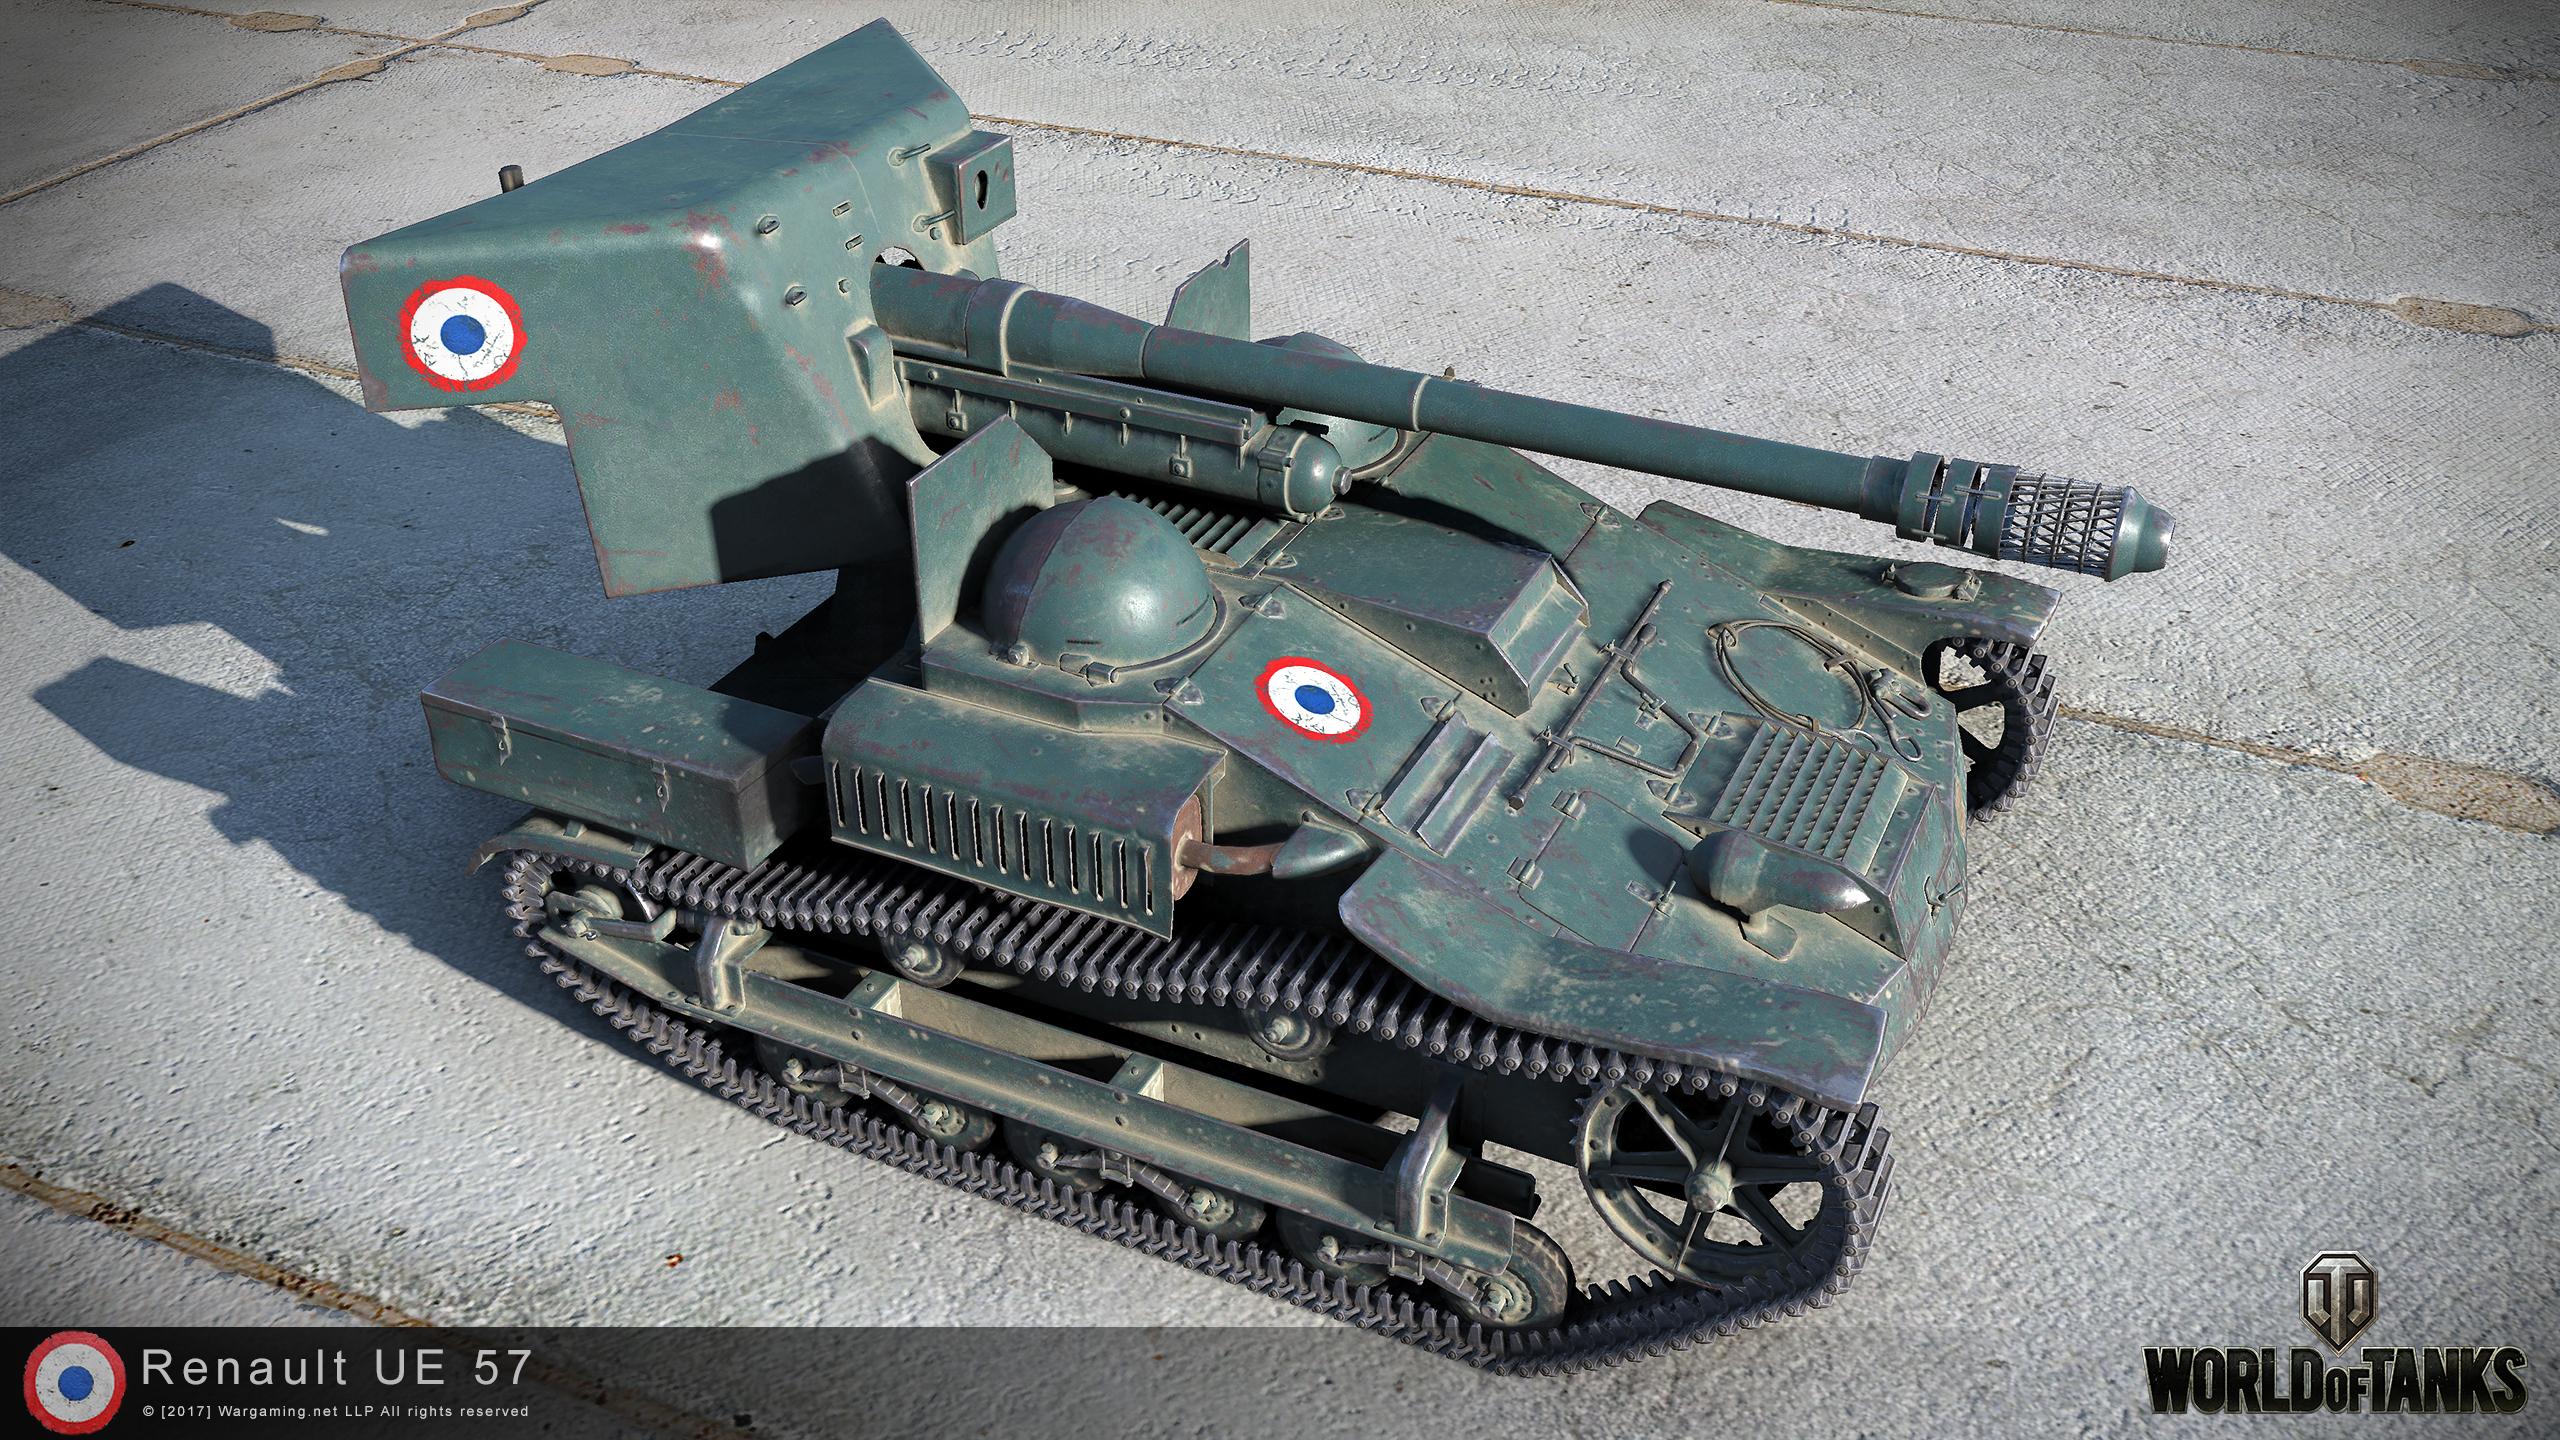 world of tanks 9.19